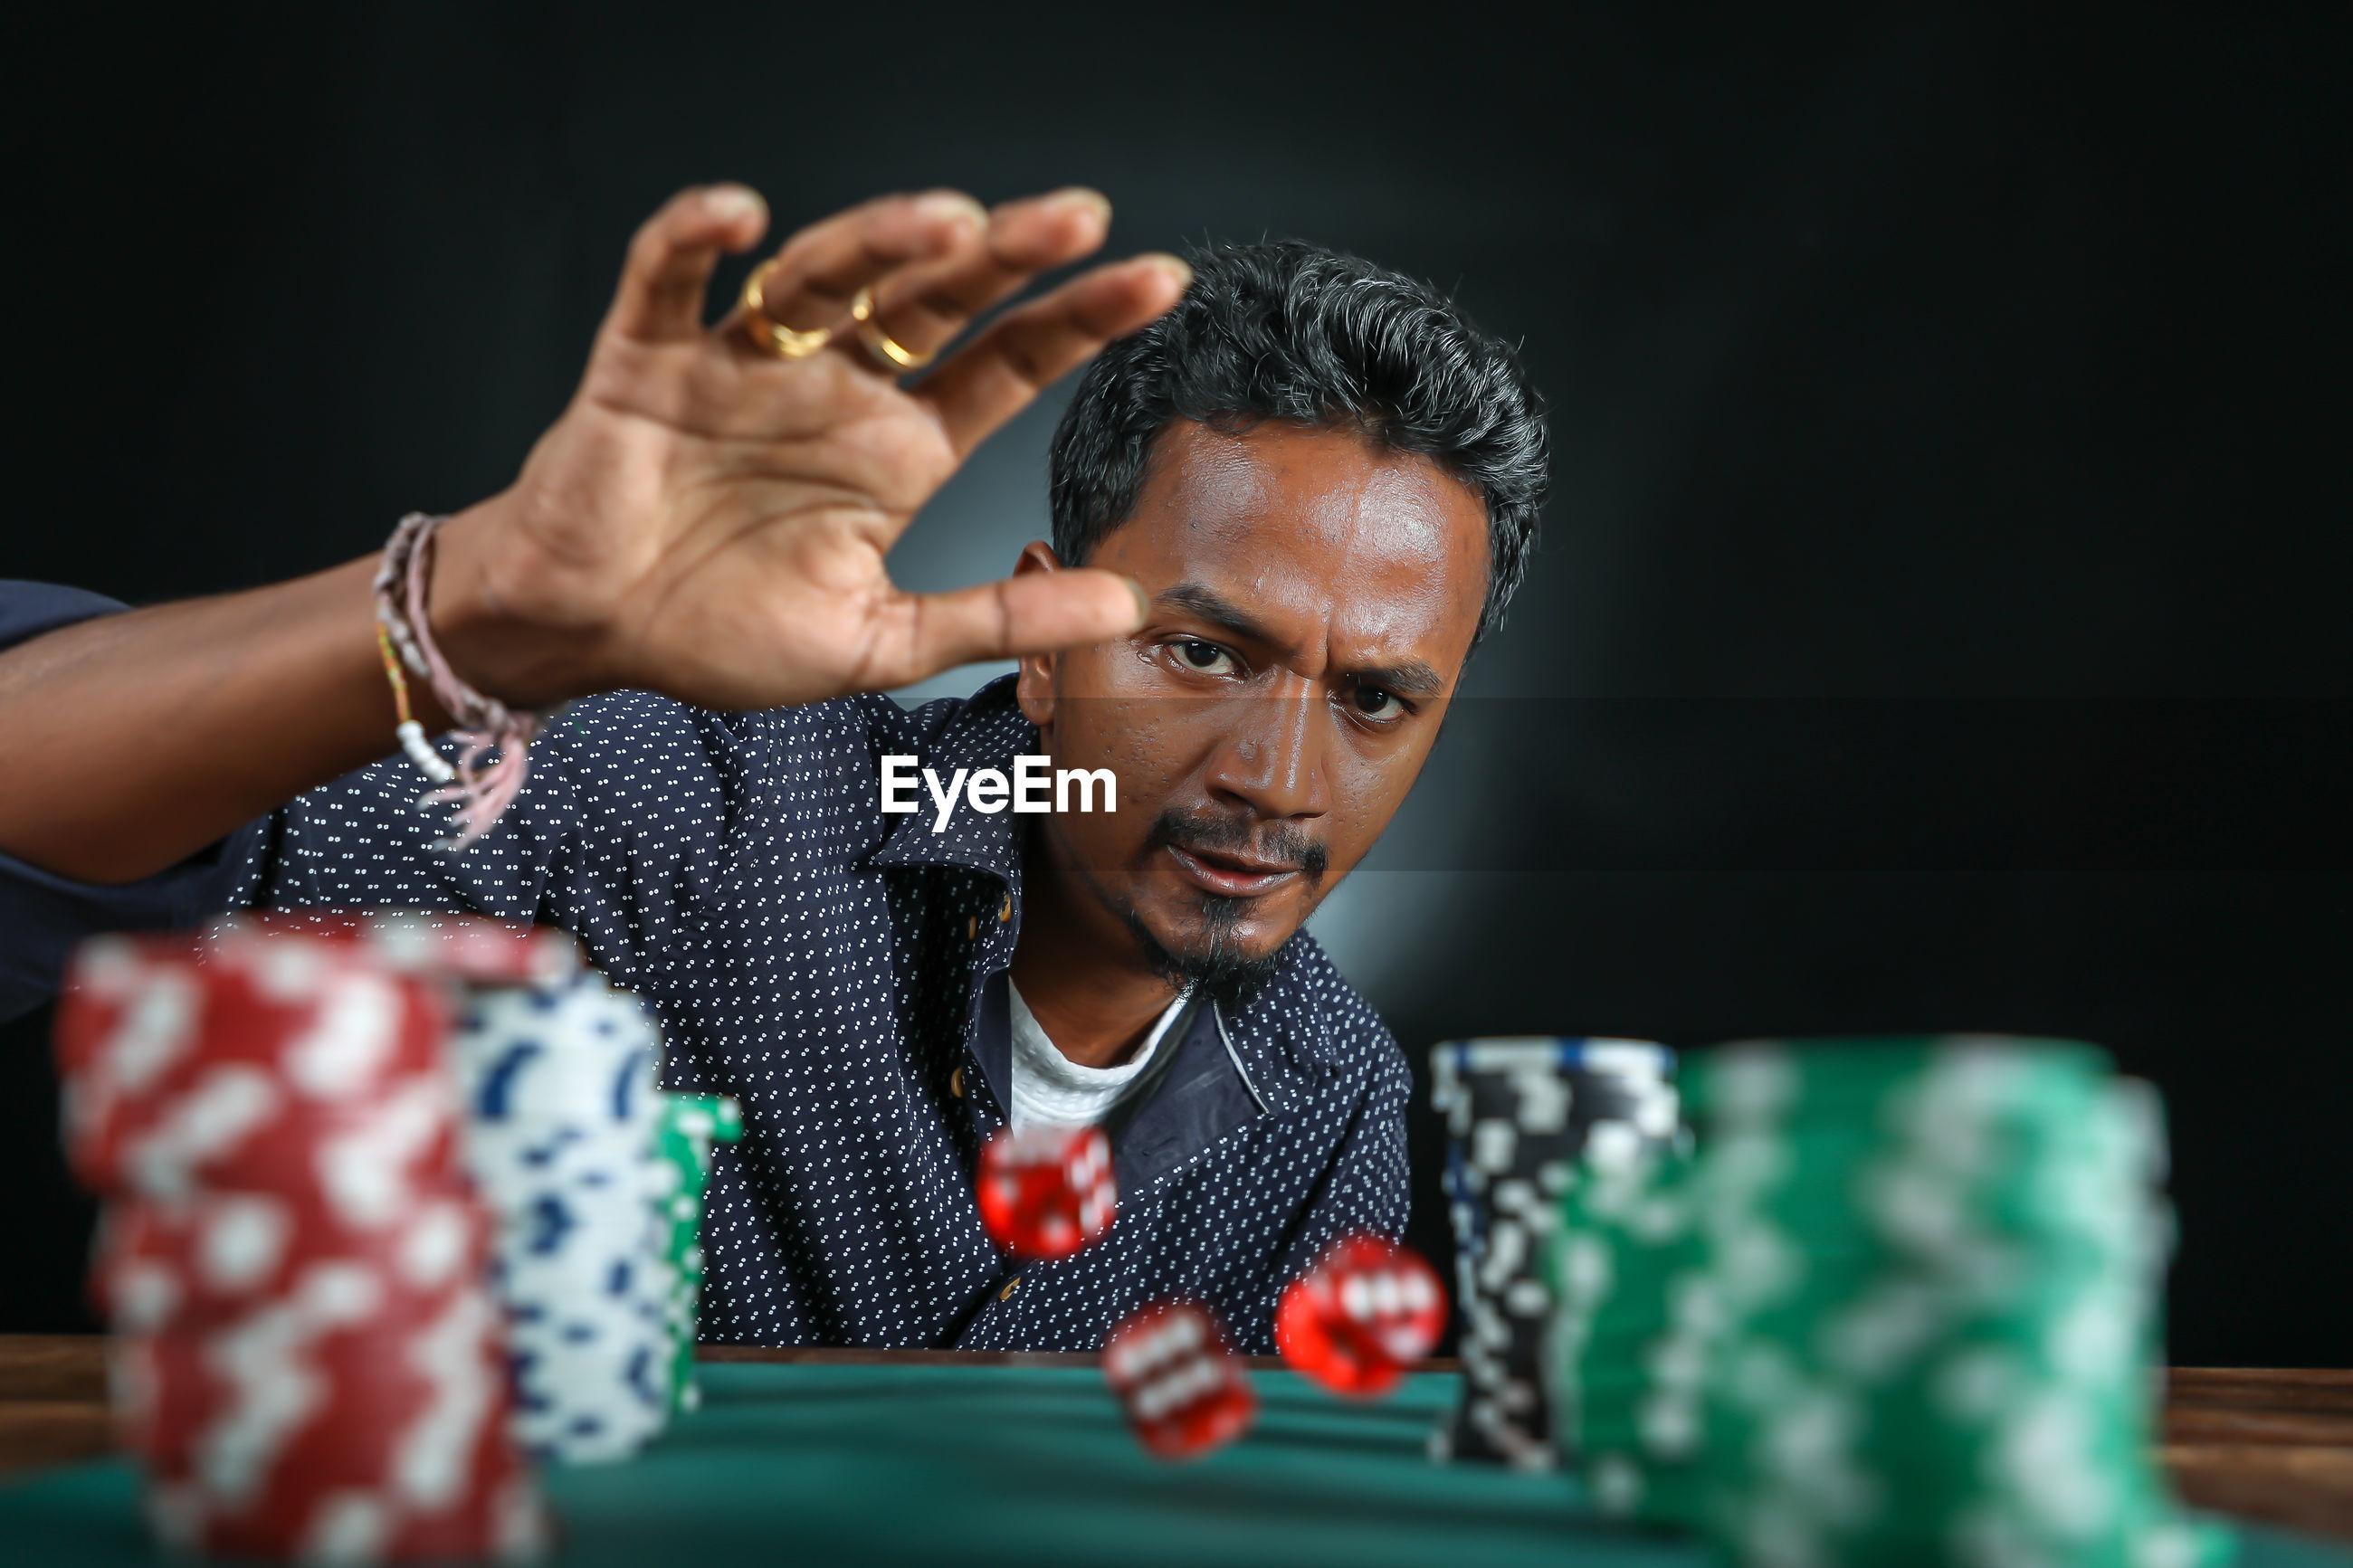 Confident mature man rolling dice at craps table against black background